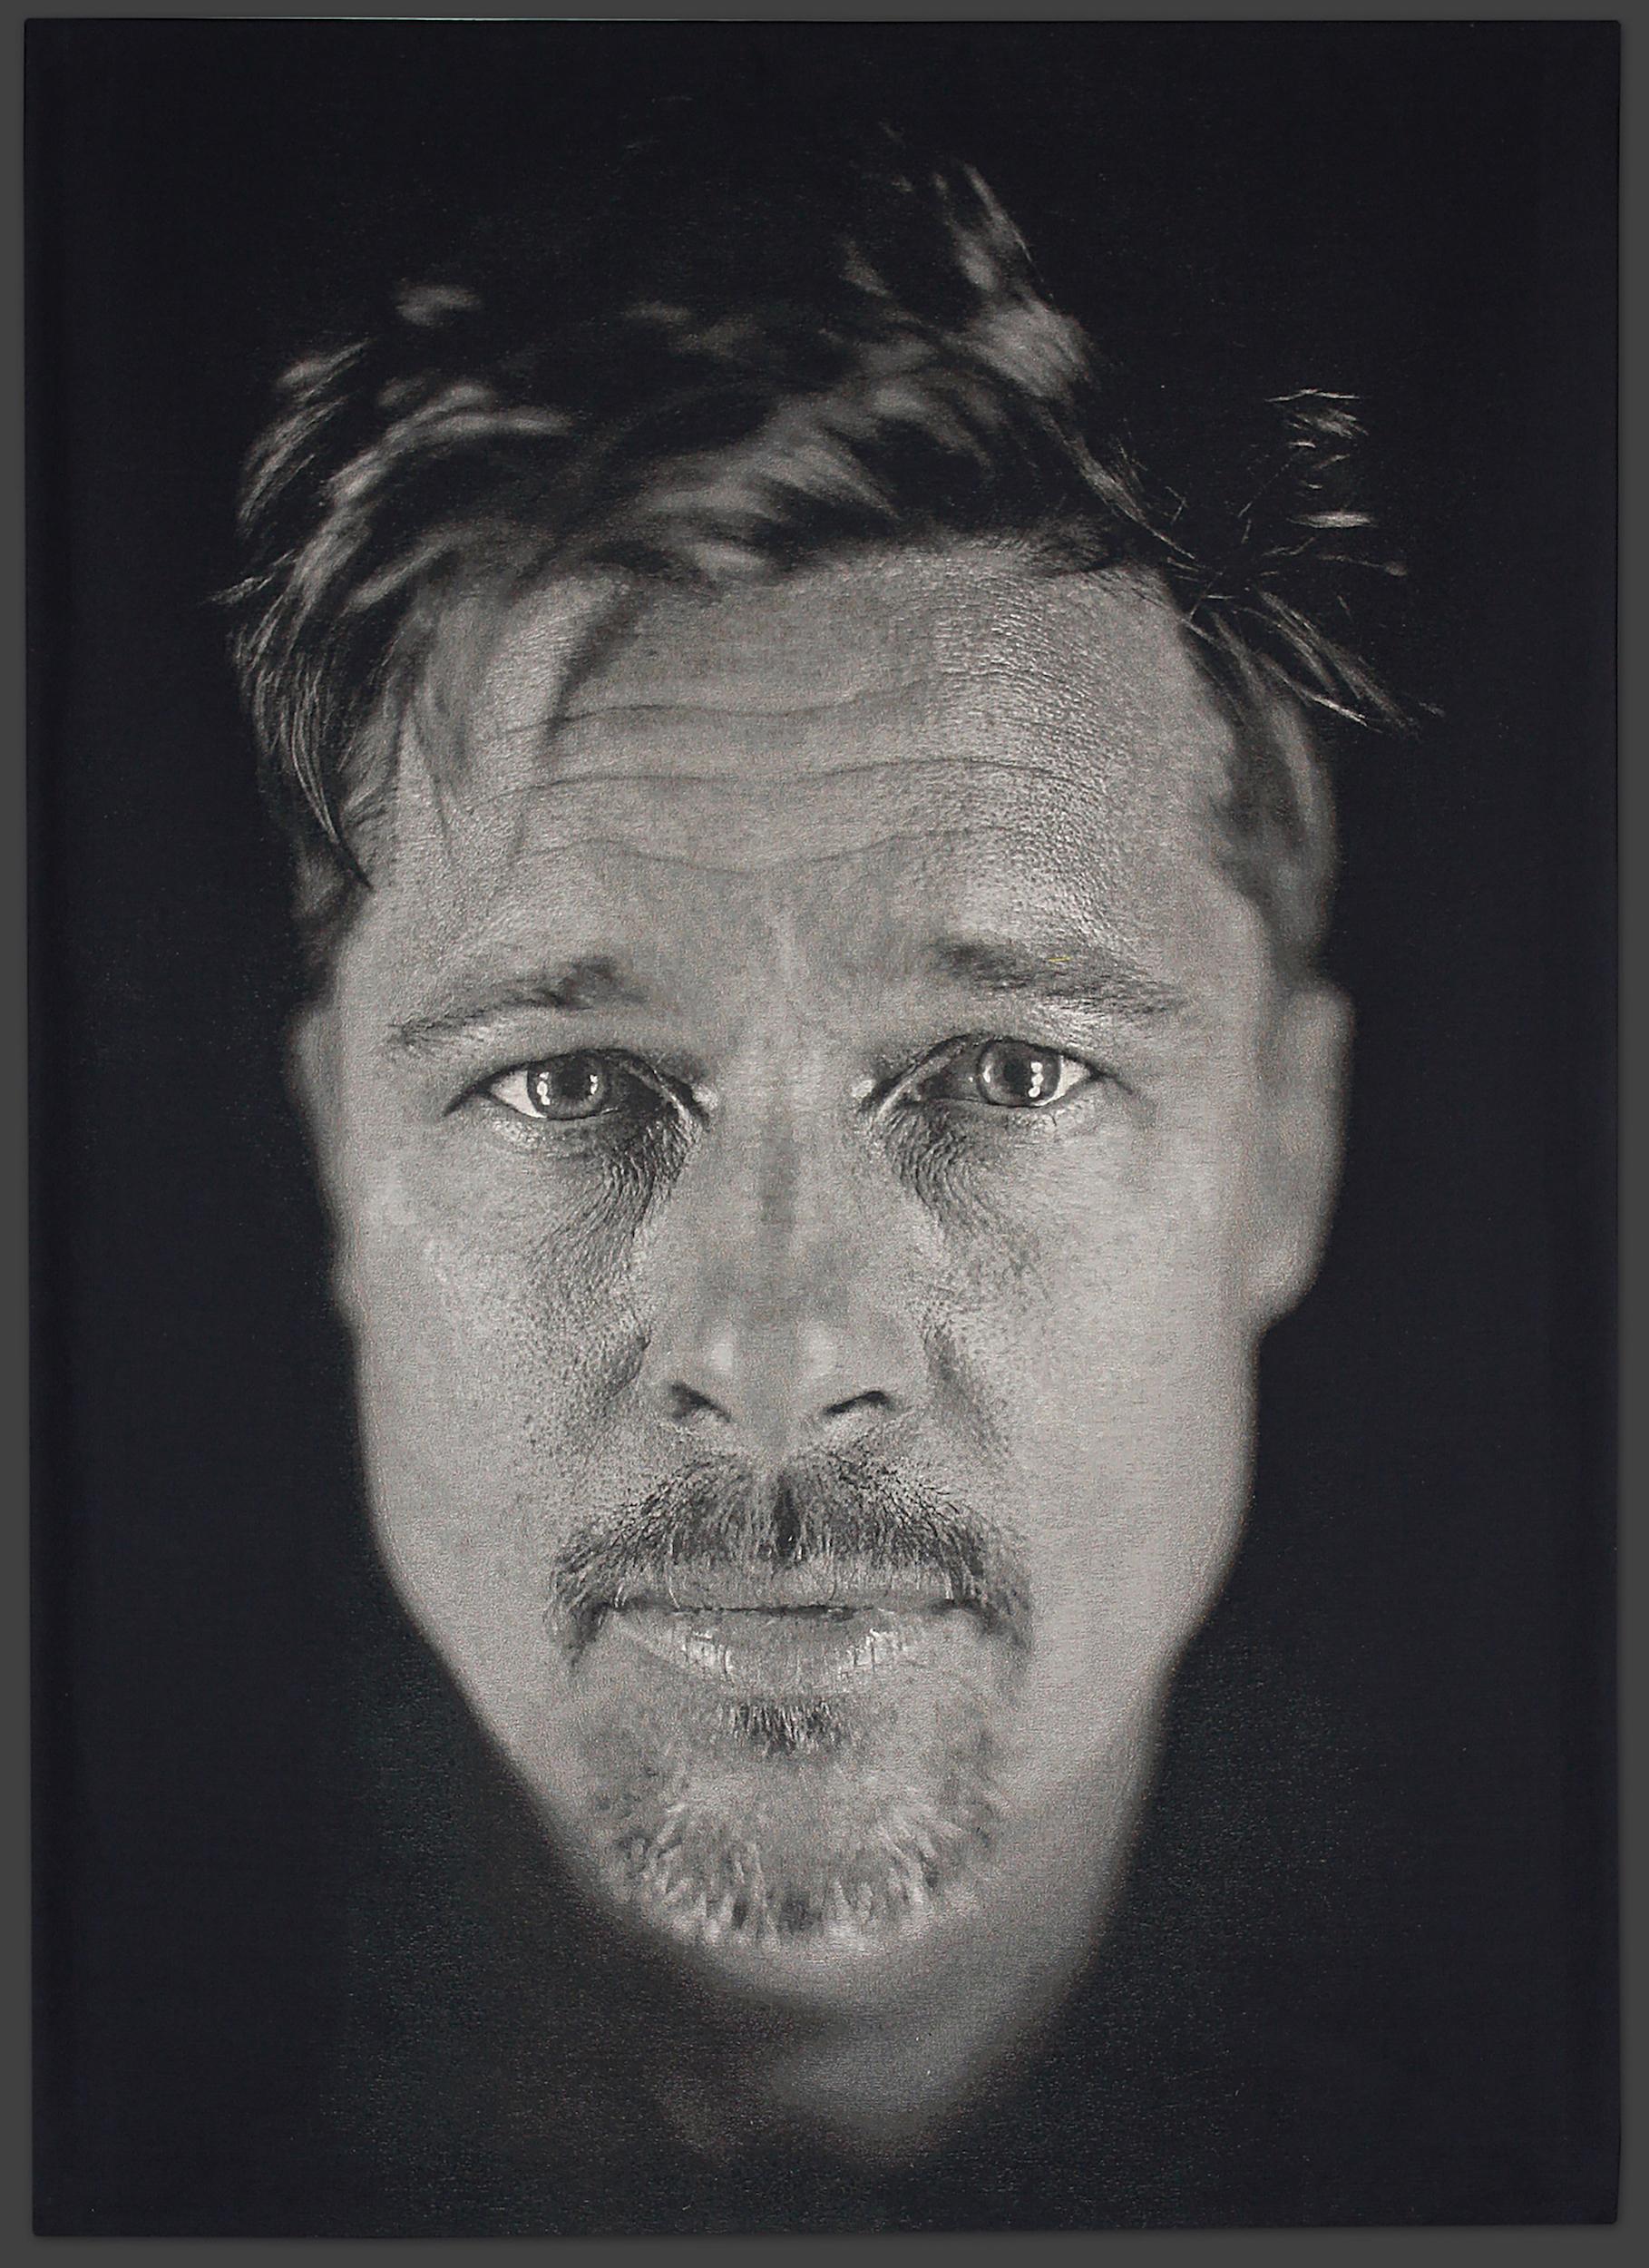 Brad Pitt Tapestry Photograph courtesy of: Chuck Close Studio